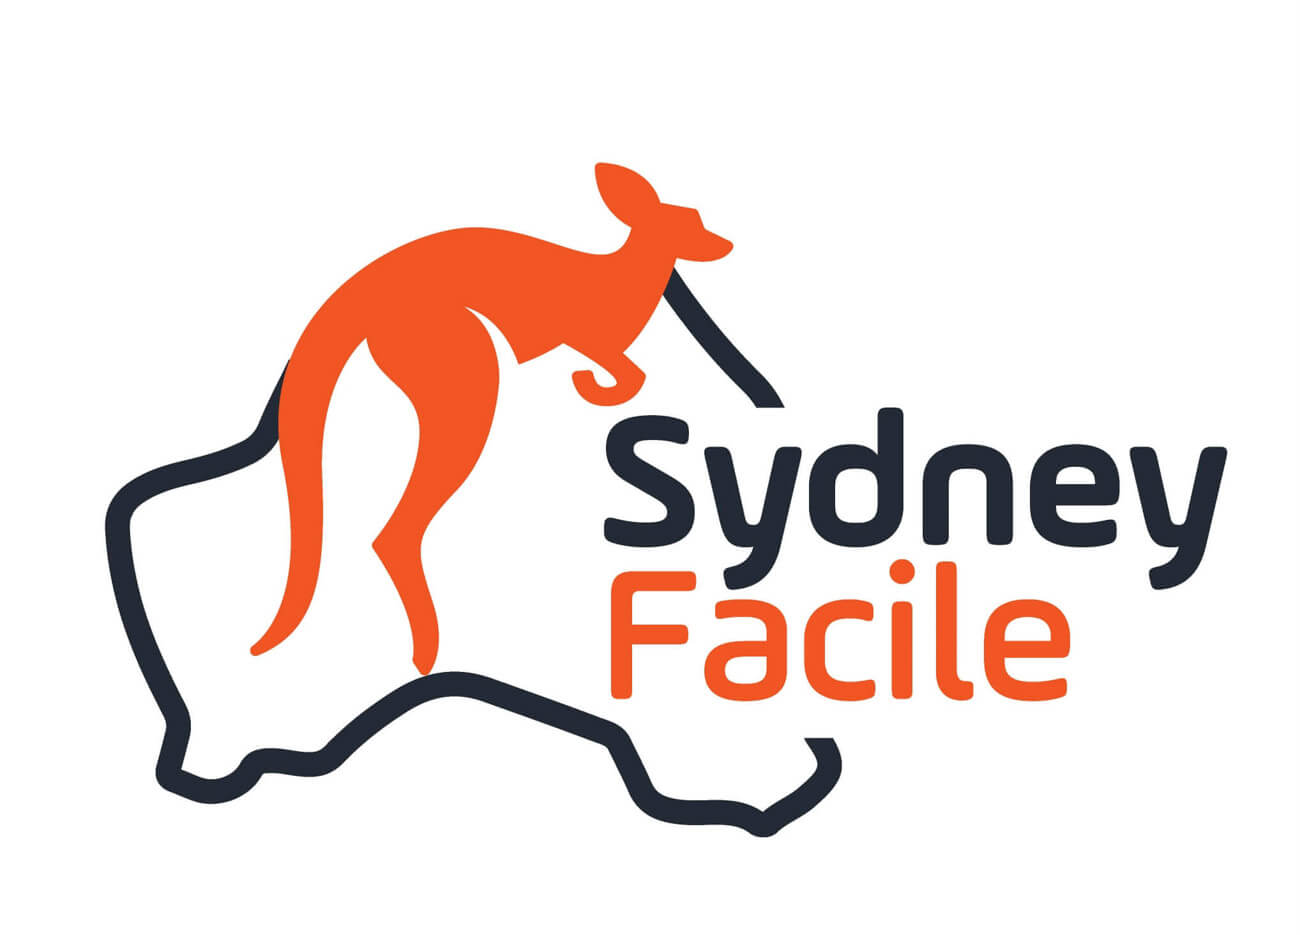 australie logo sydney facile